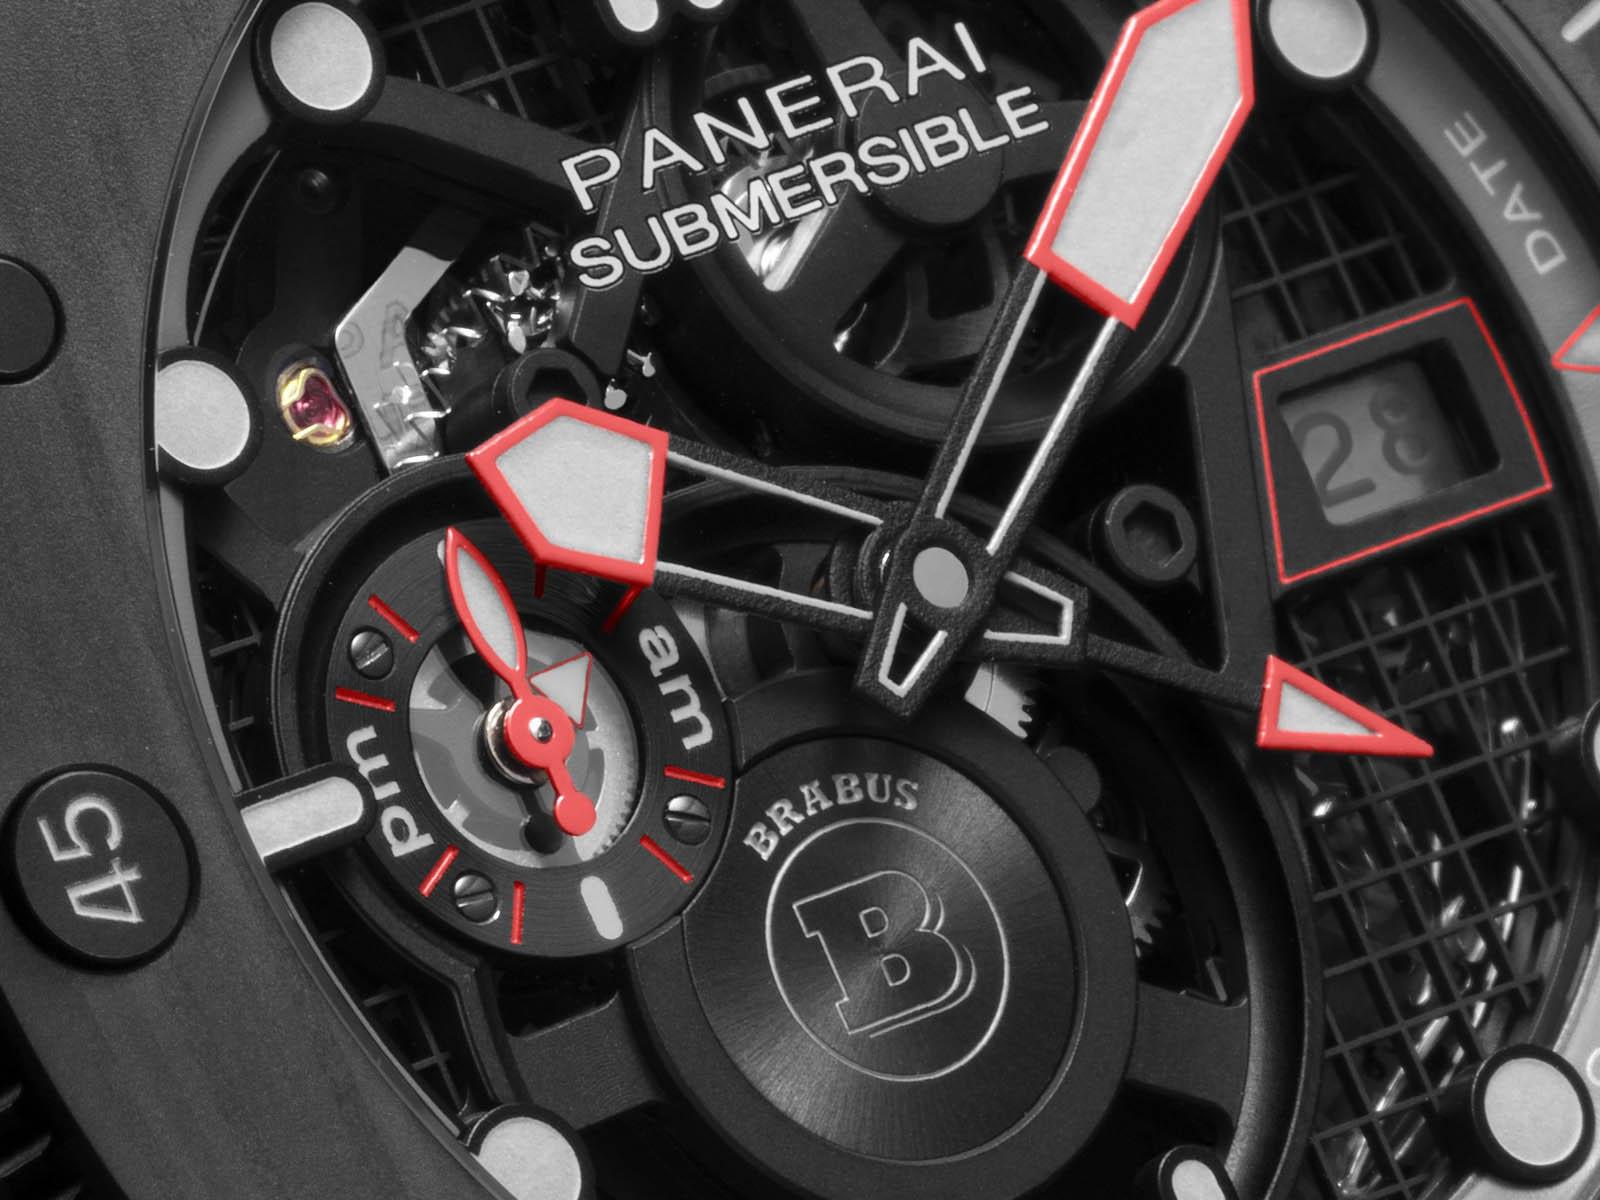 pam01240-officine-panerai-submersible-s-brabus-shadow-black-ops-7.jpg